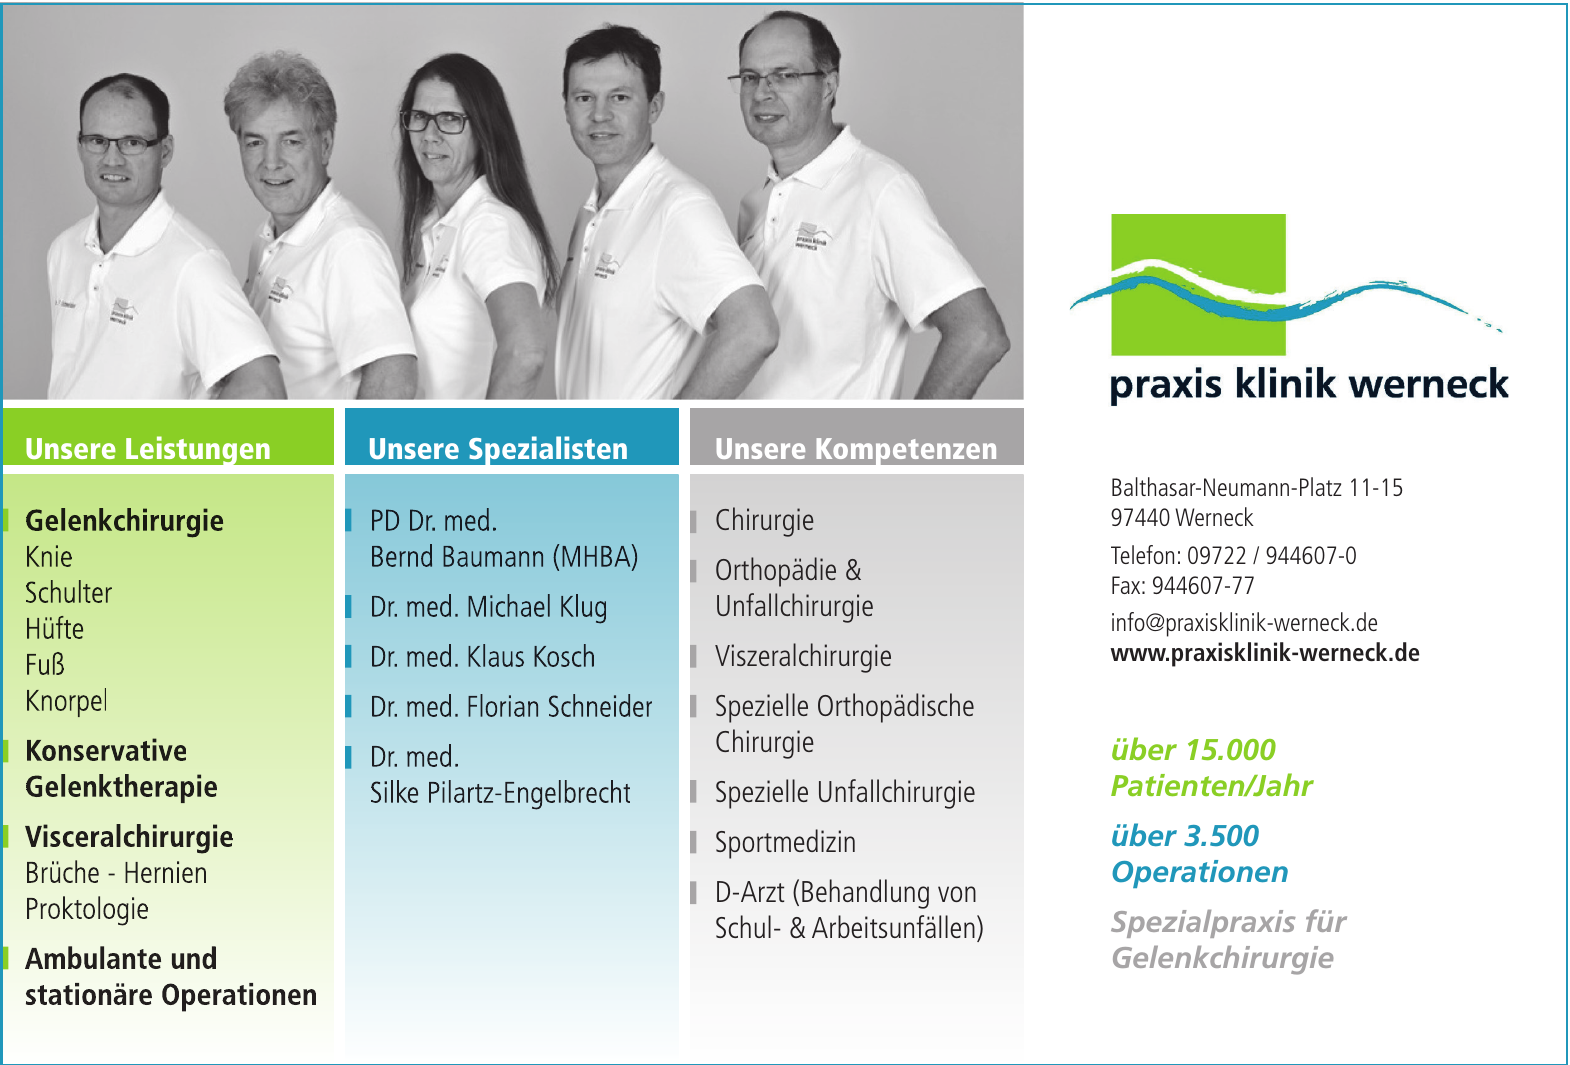 Praxisklinik Werneck